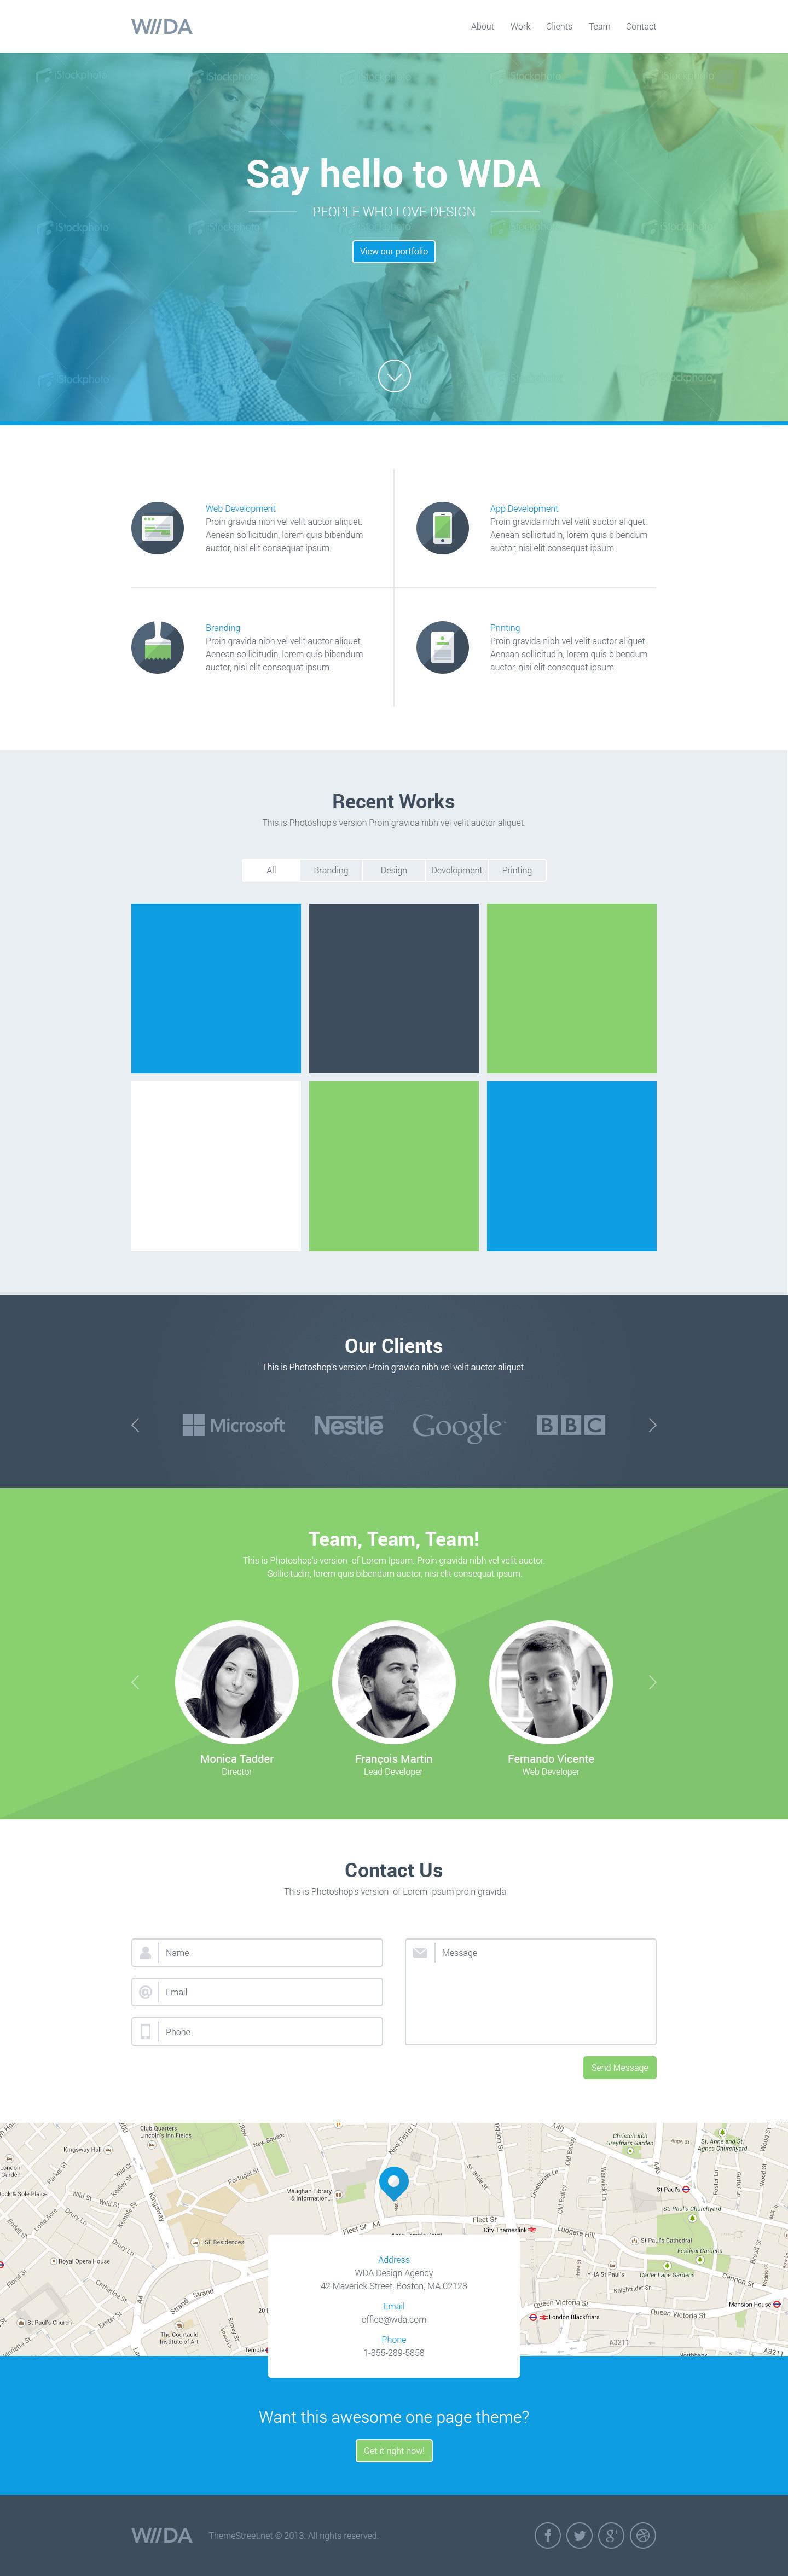 WDA - Creative Responsive Landing Page by ThemeStreetNet   ThemeForest